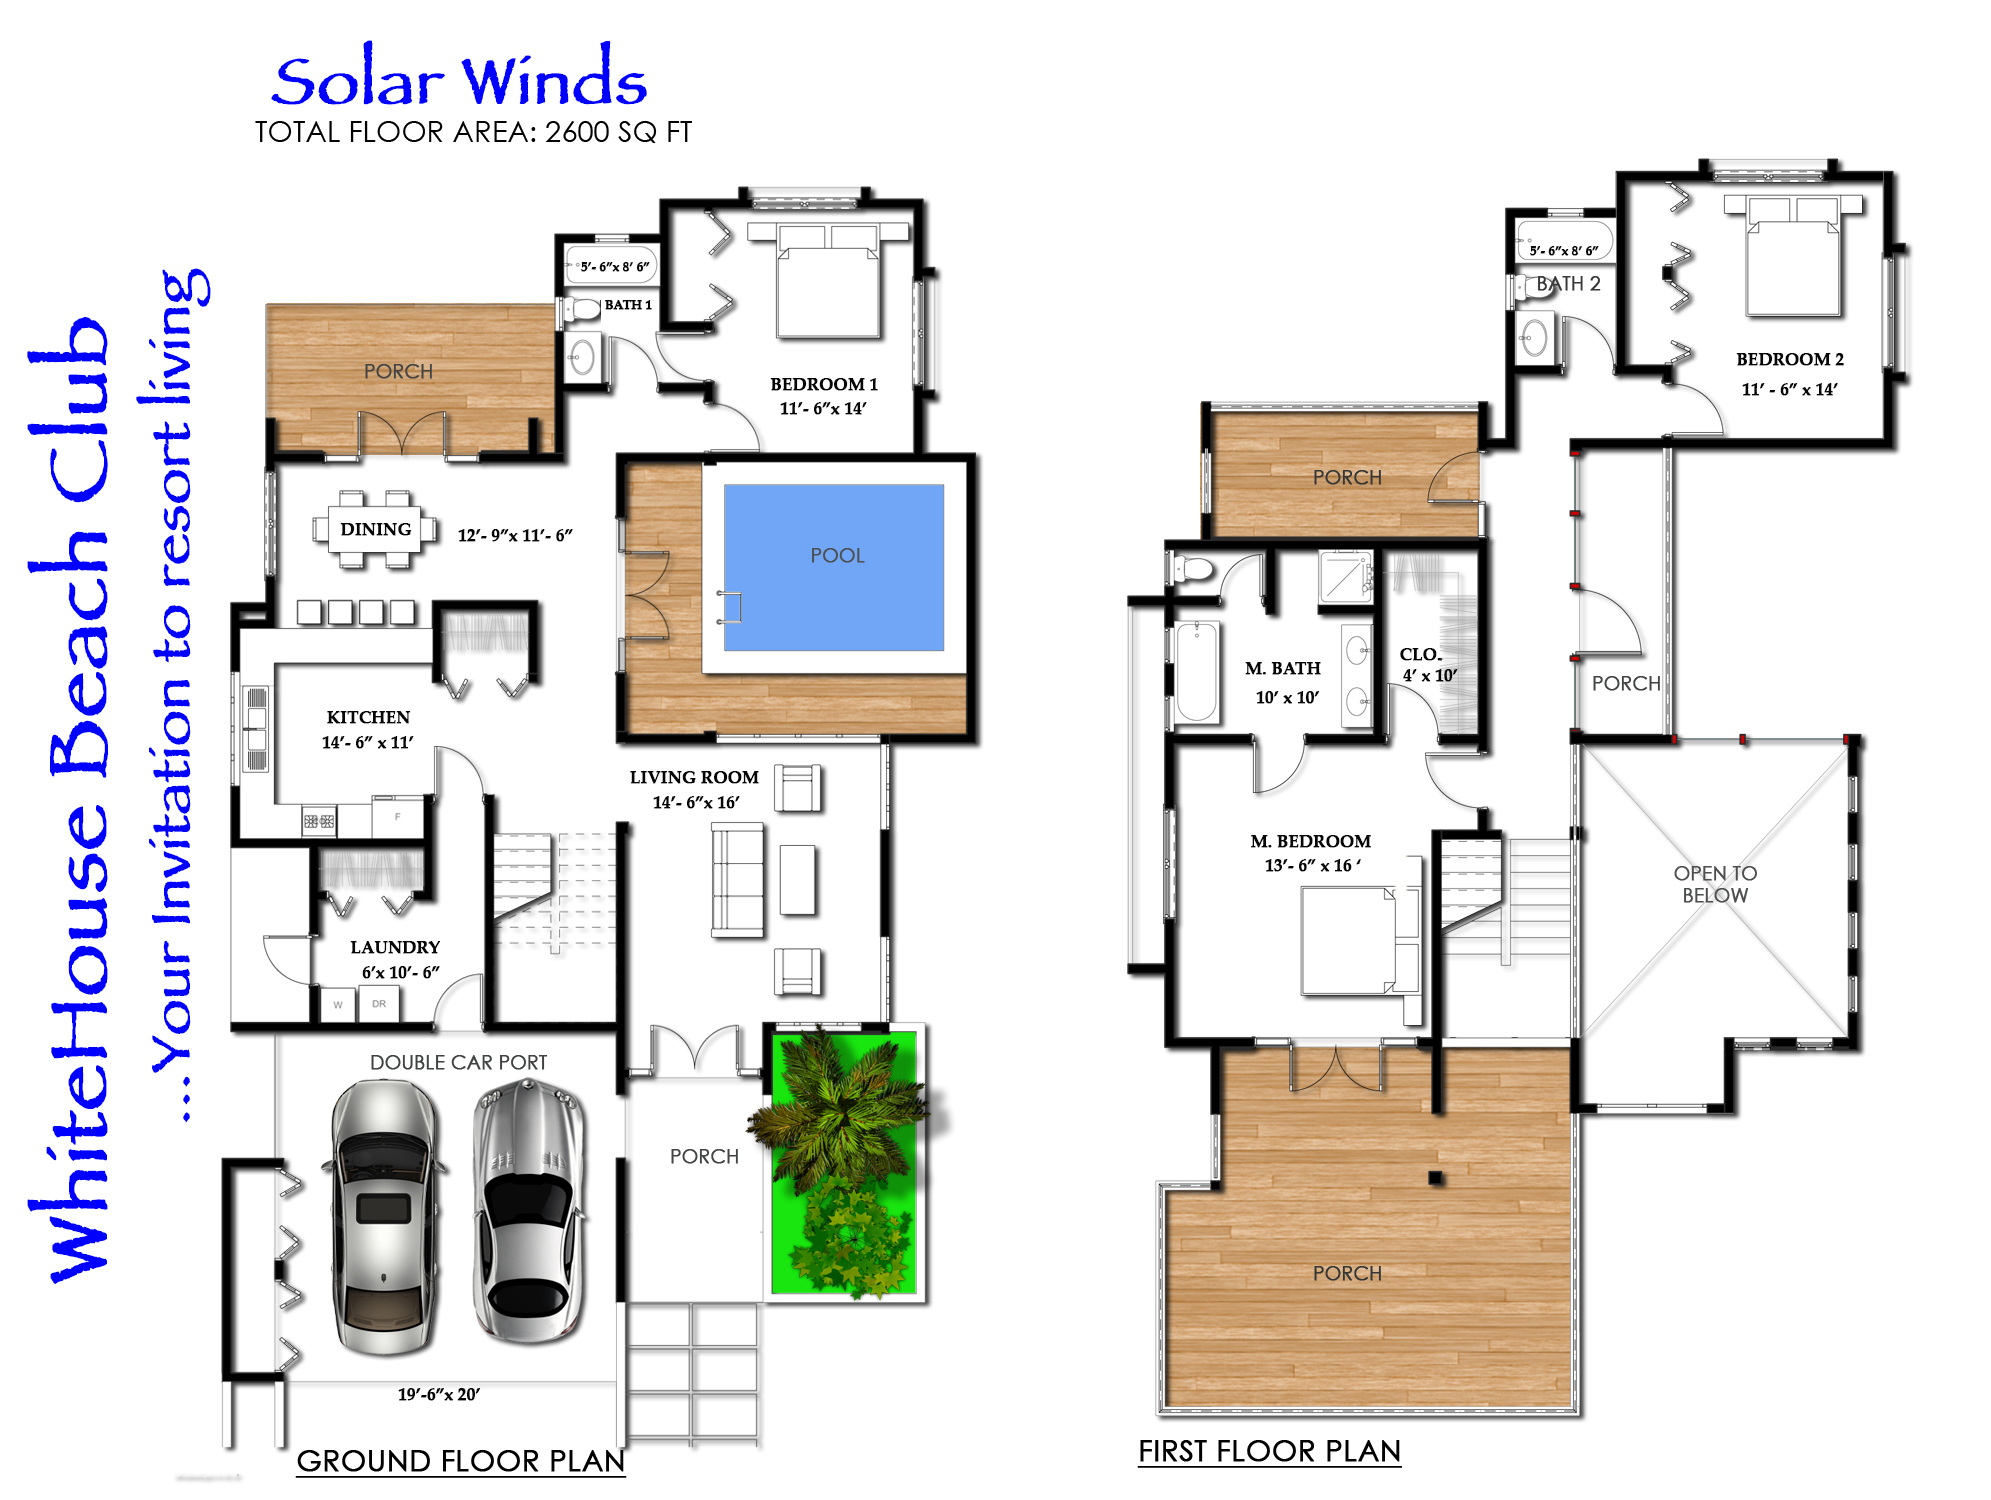 2 Solar Winds